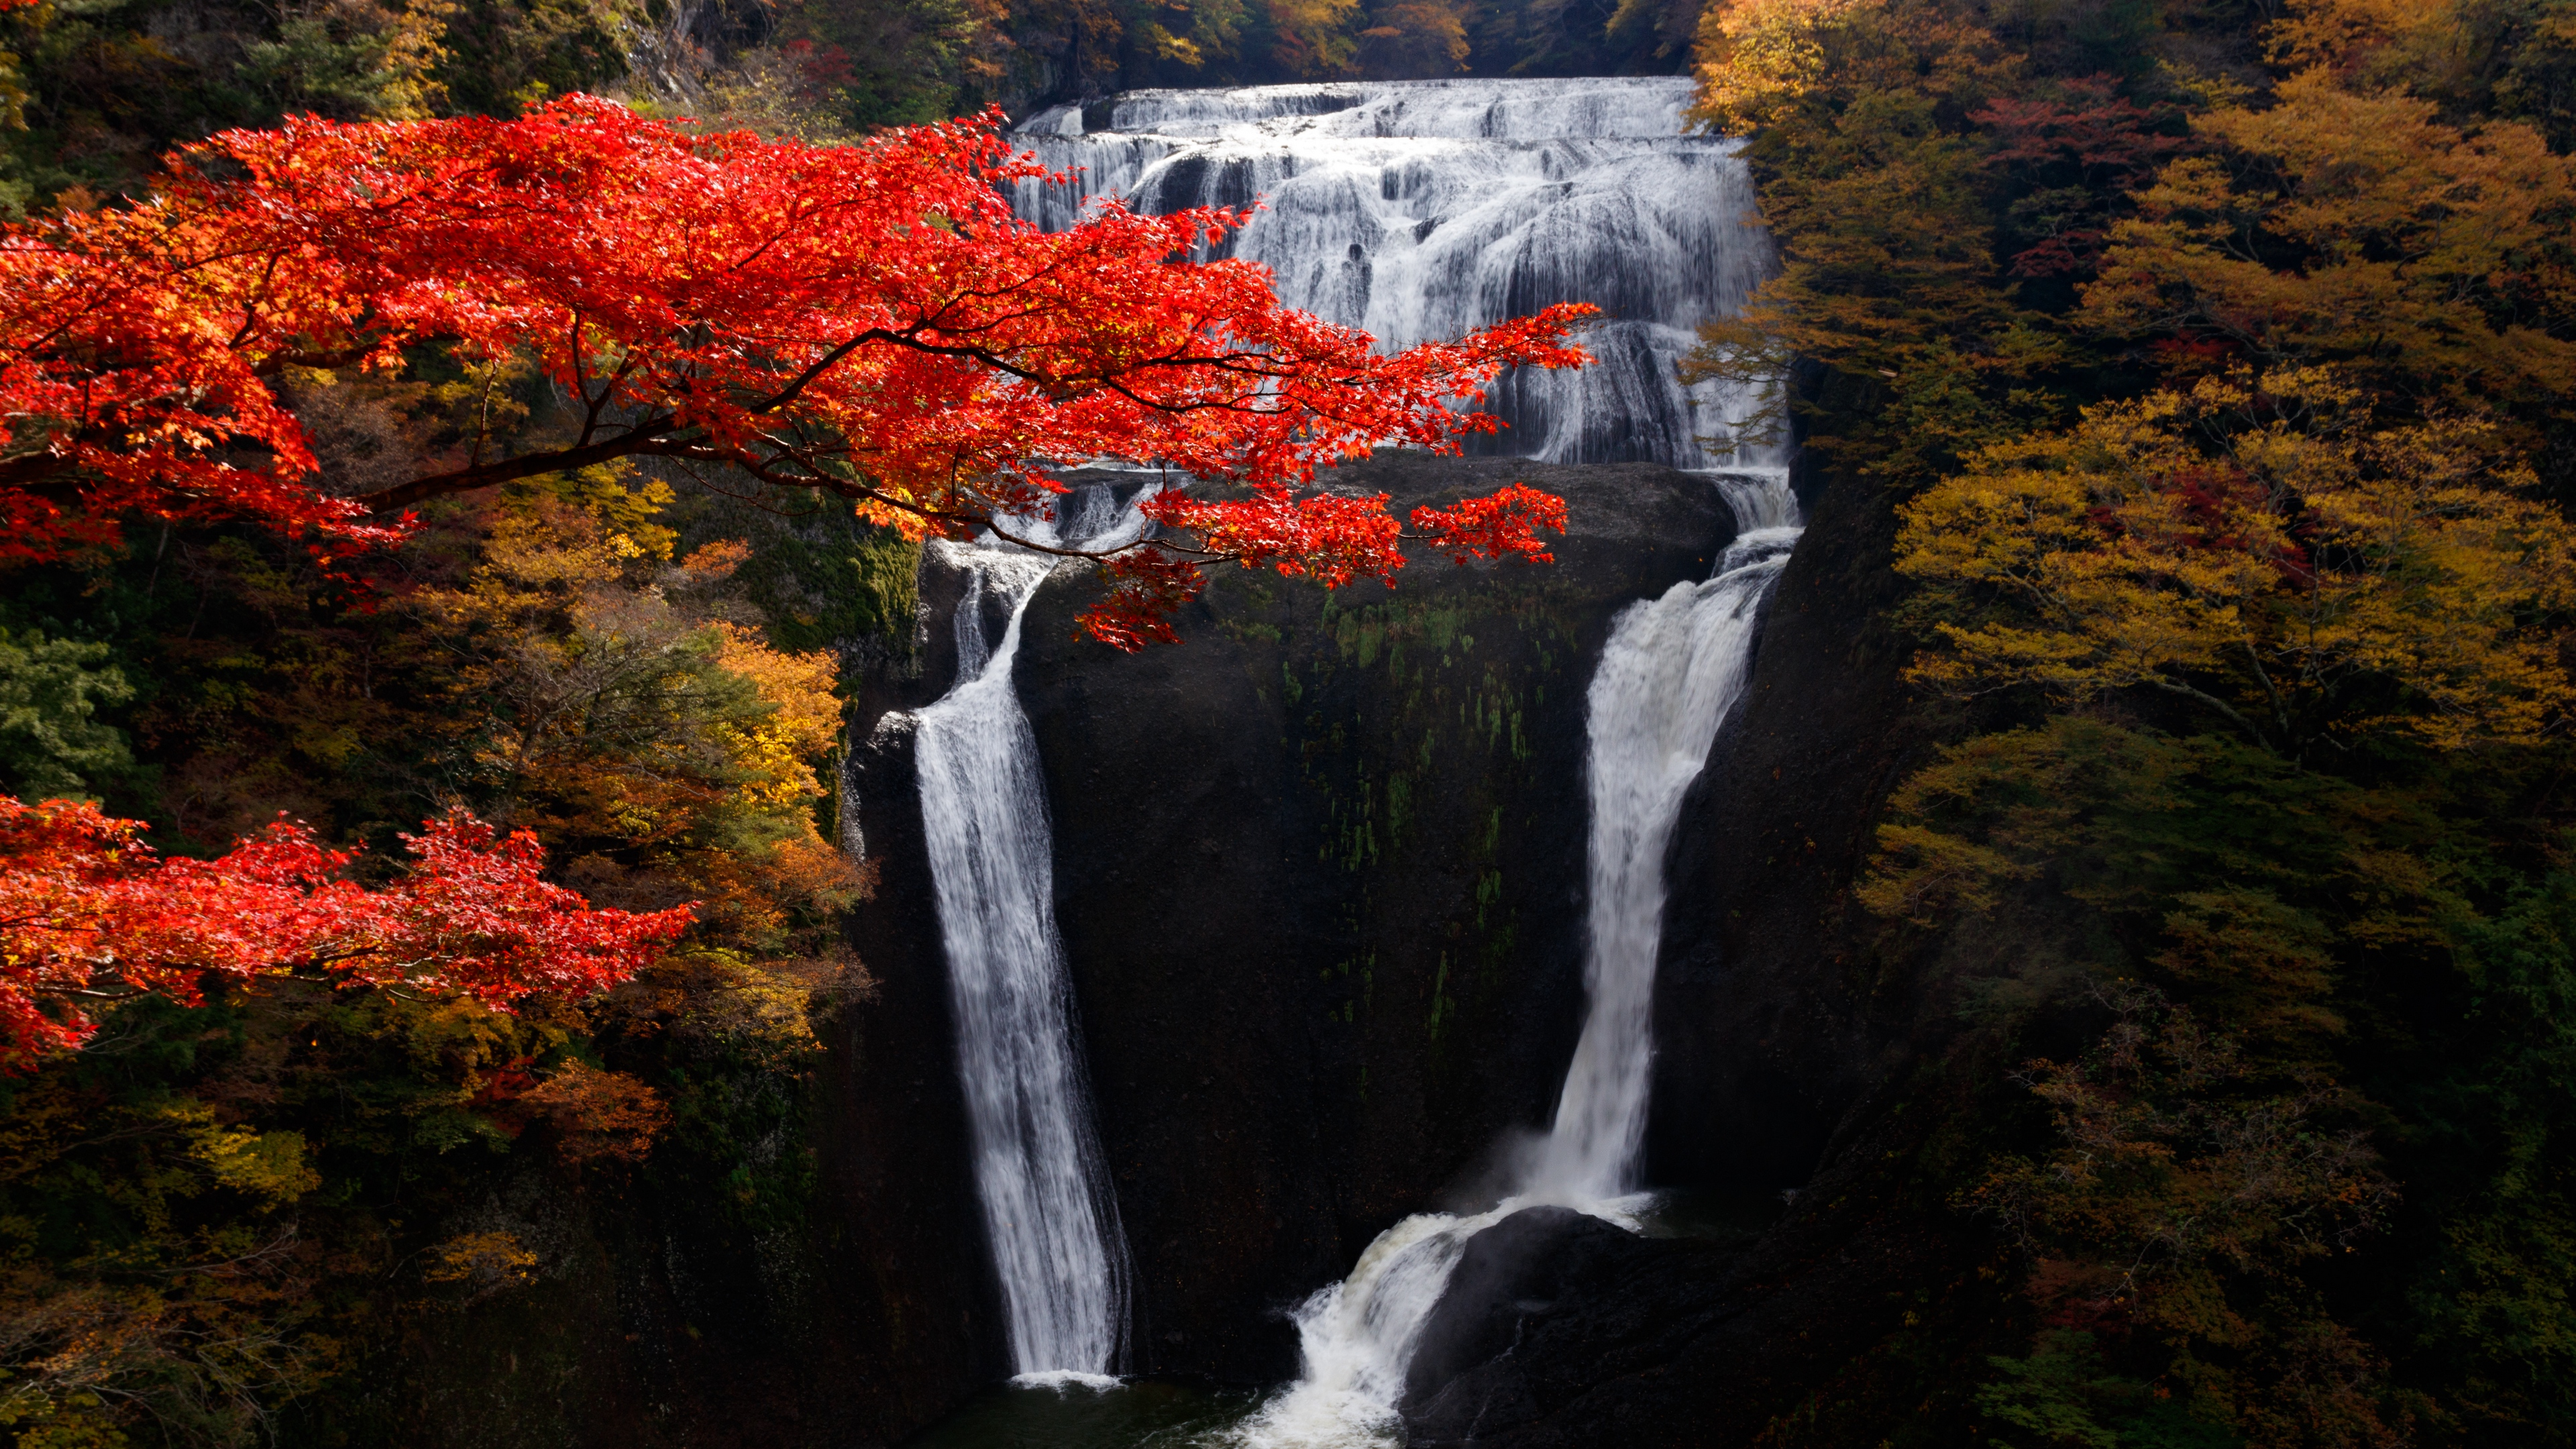 waterfall trees precipice current autumn 4k 1541117260 - waterfall, trees, precipice, current, autumn 4k - Waterfall, Trees, precipice